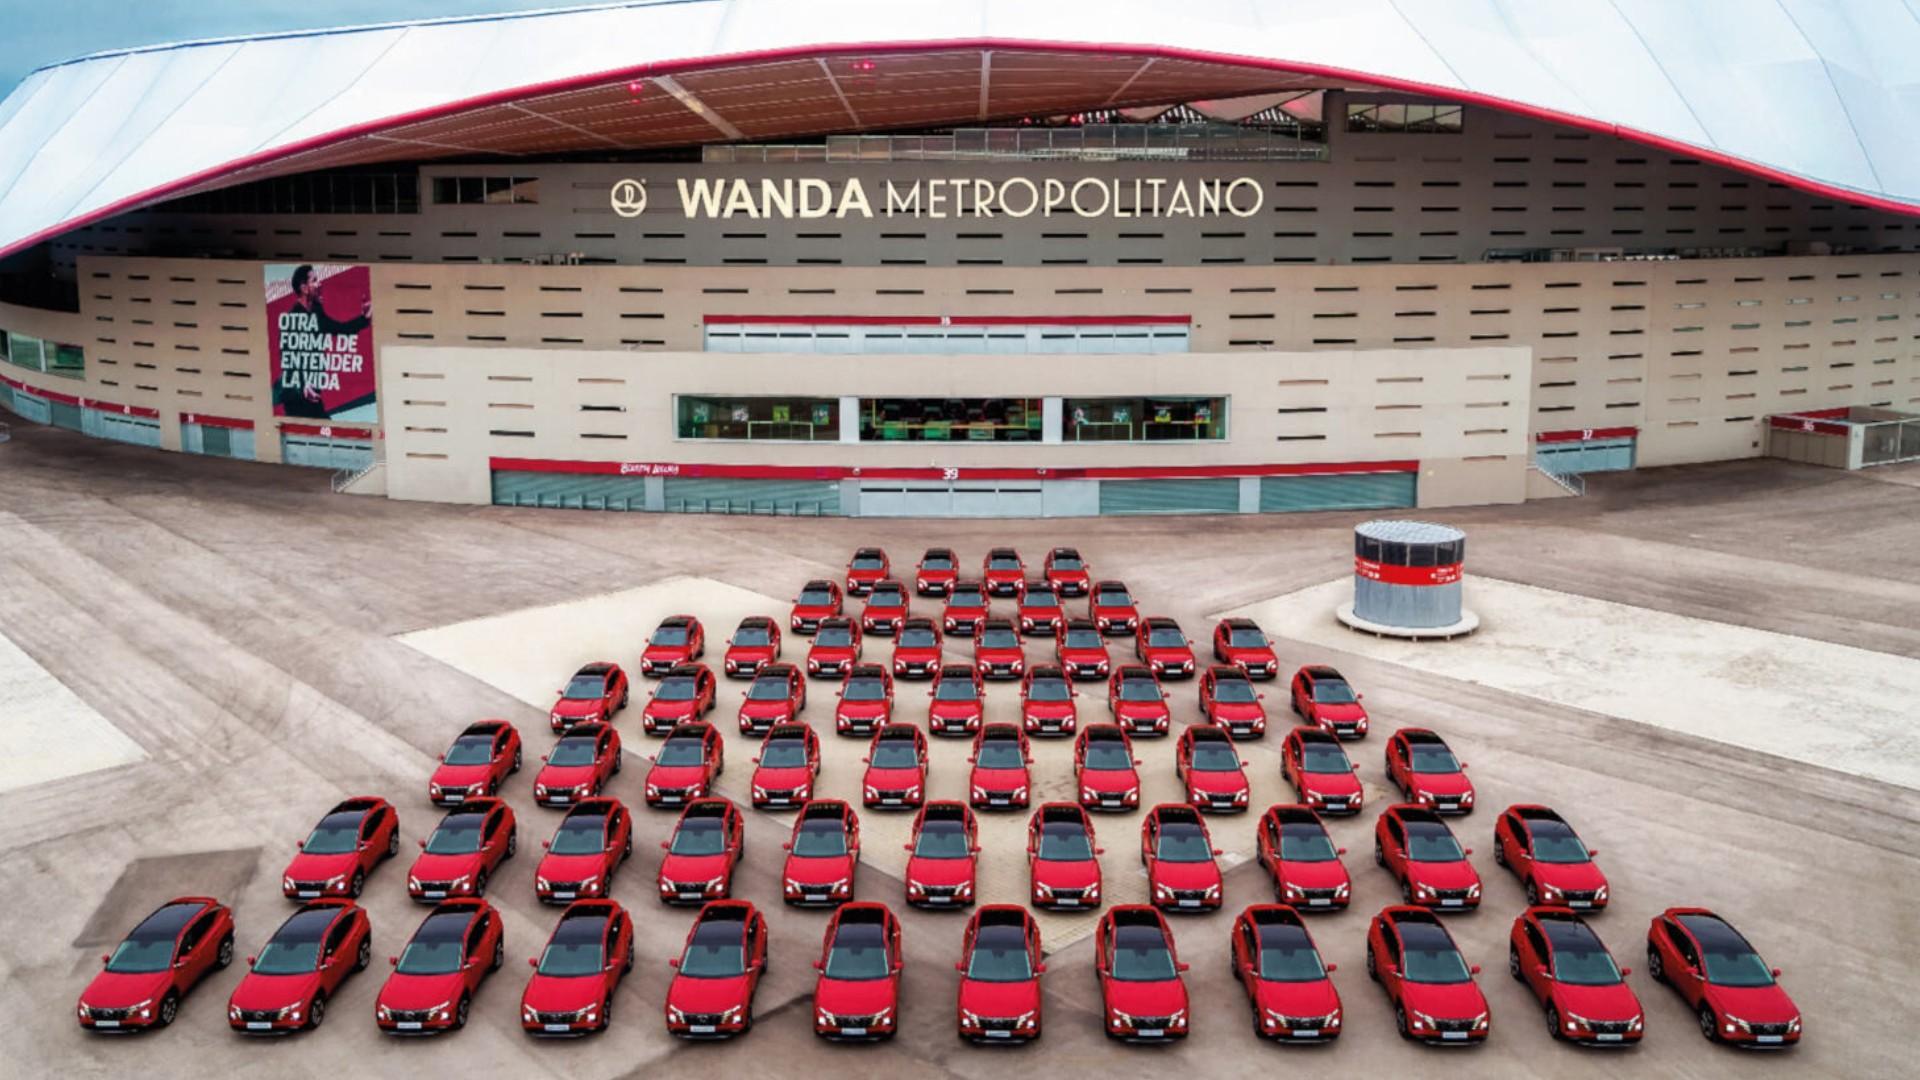 Hyundai: Ένα Tucson για κάθε παίχτη/παίχτρια της Atlético Madrid [vid]